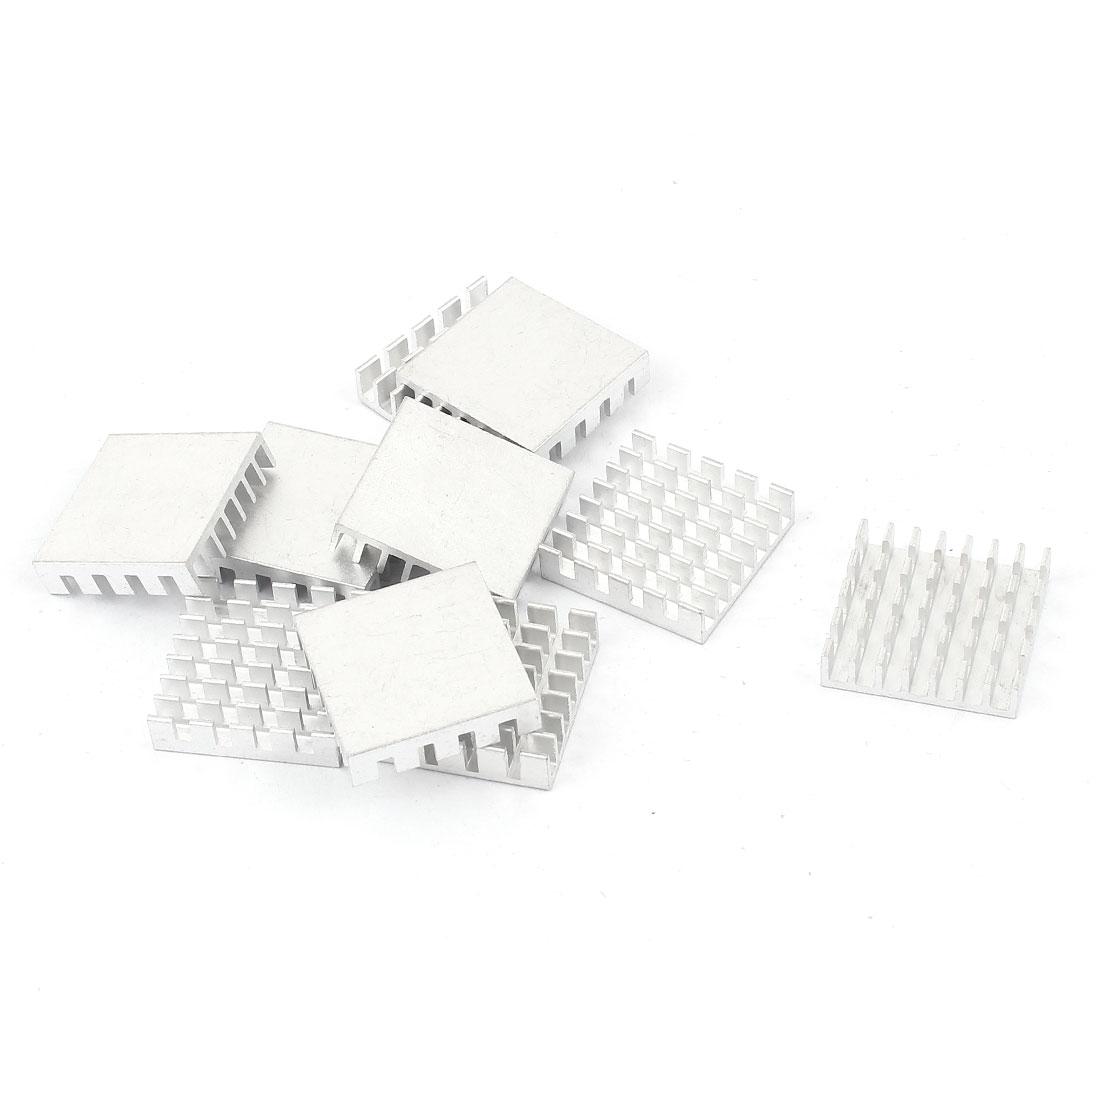 10 Pcs Square Aluminum Heatsink Radiator Heat Sink Cooling Cooler Fin 22mmx22mmx6mm Silver Tone